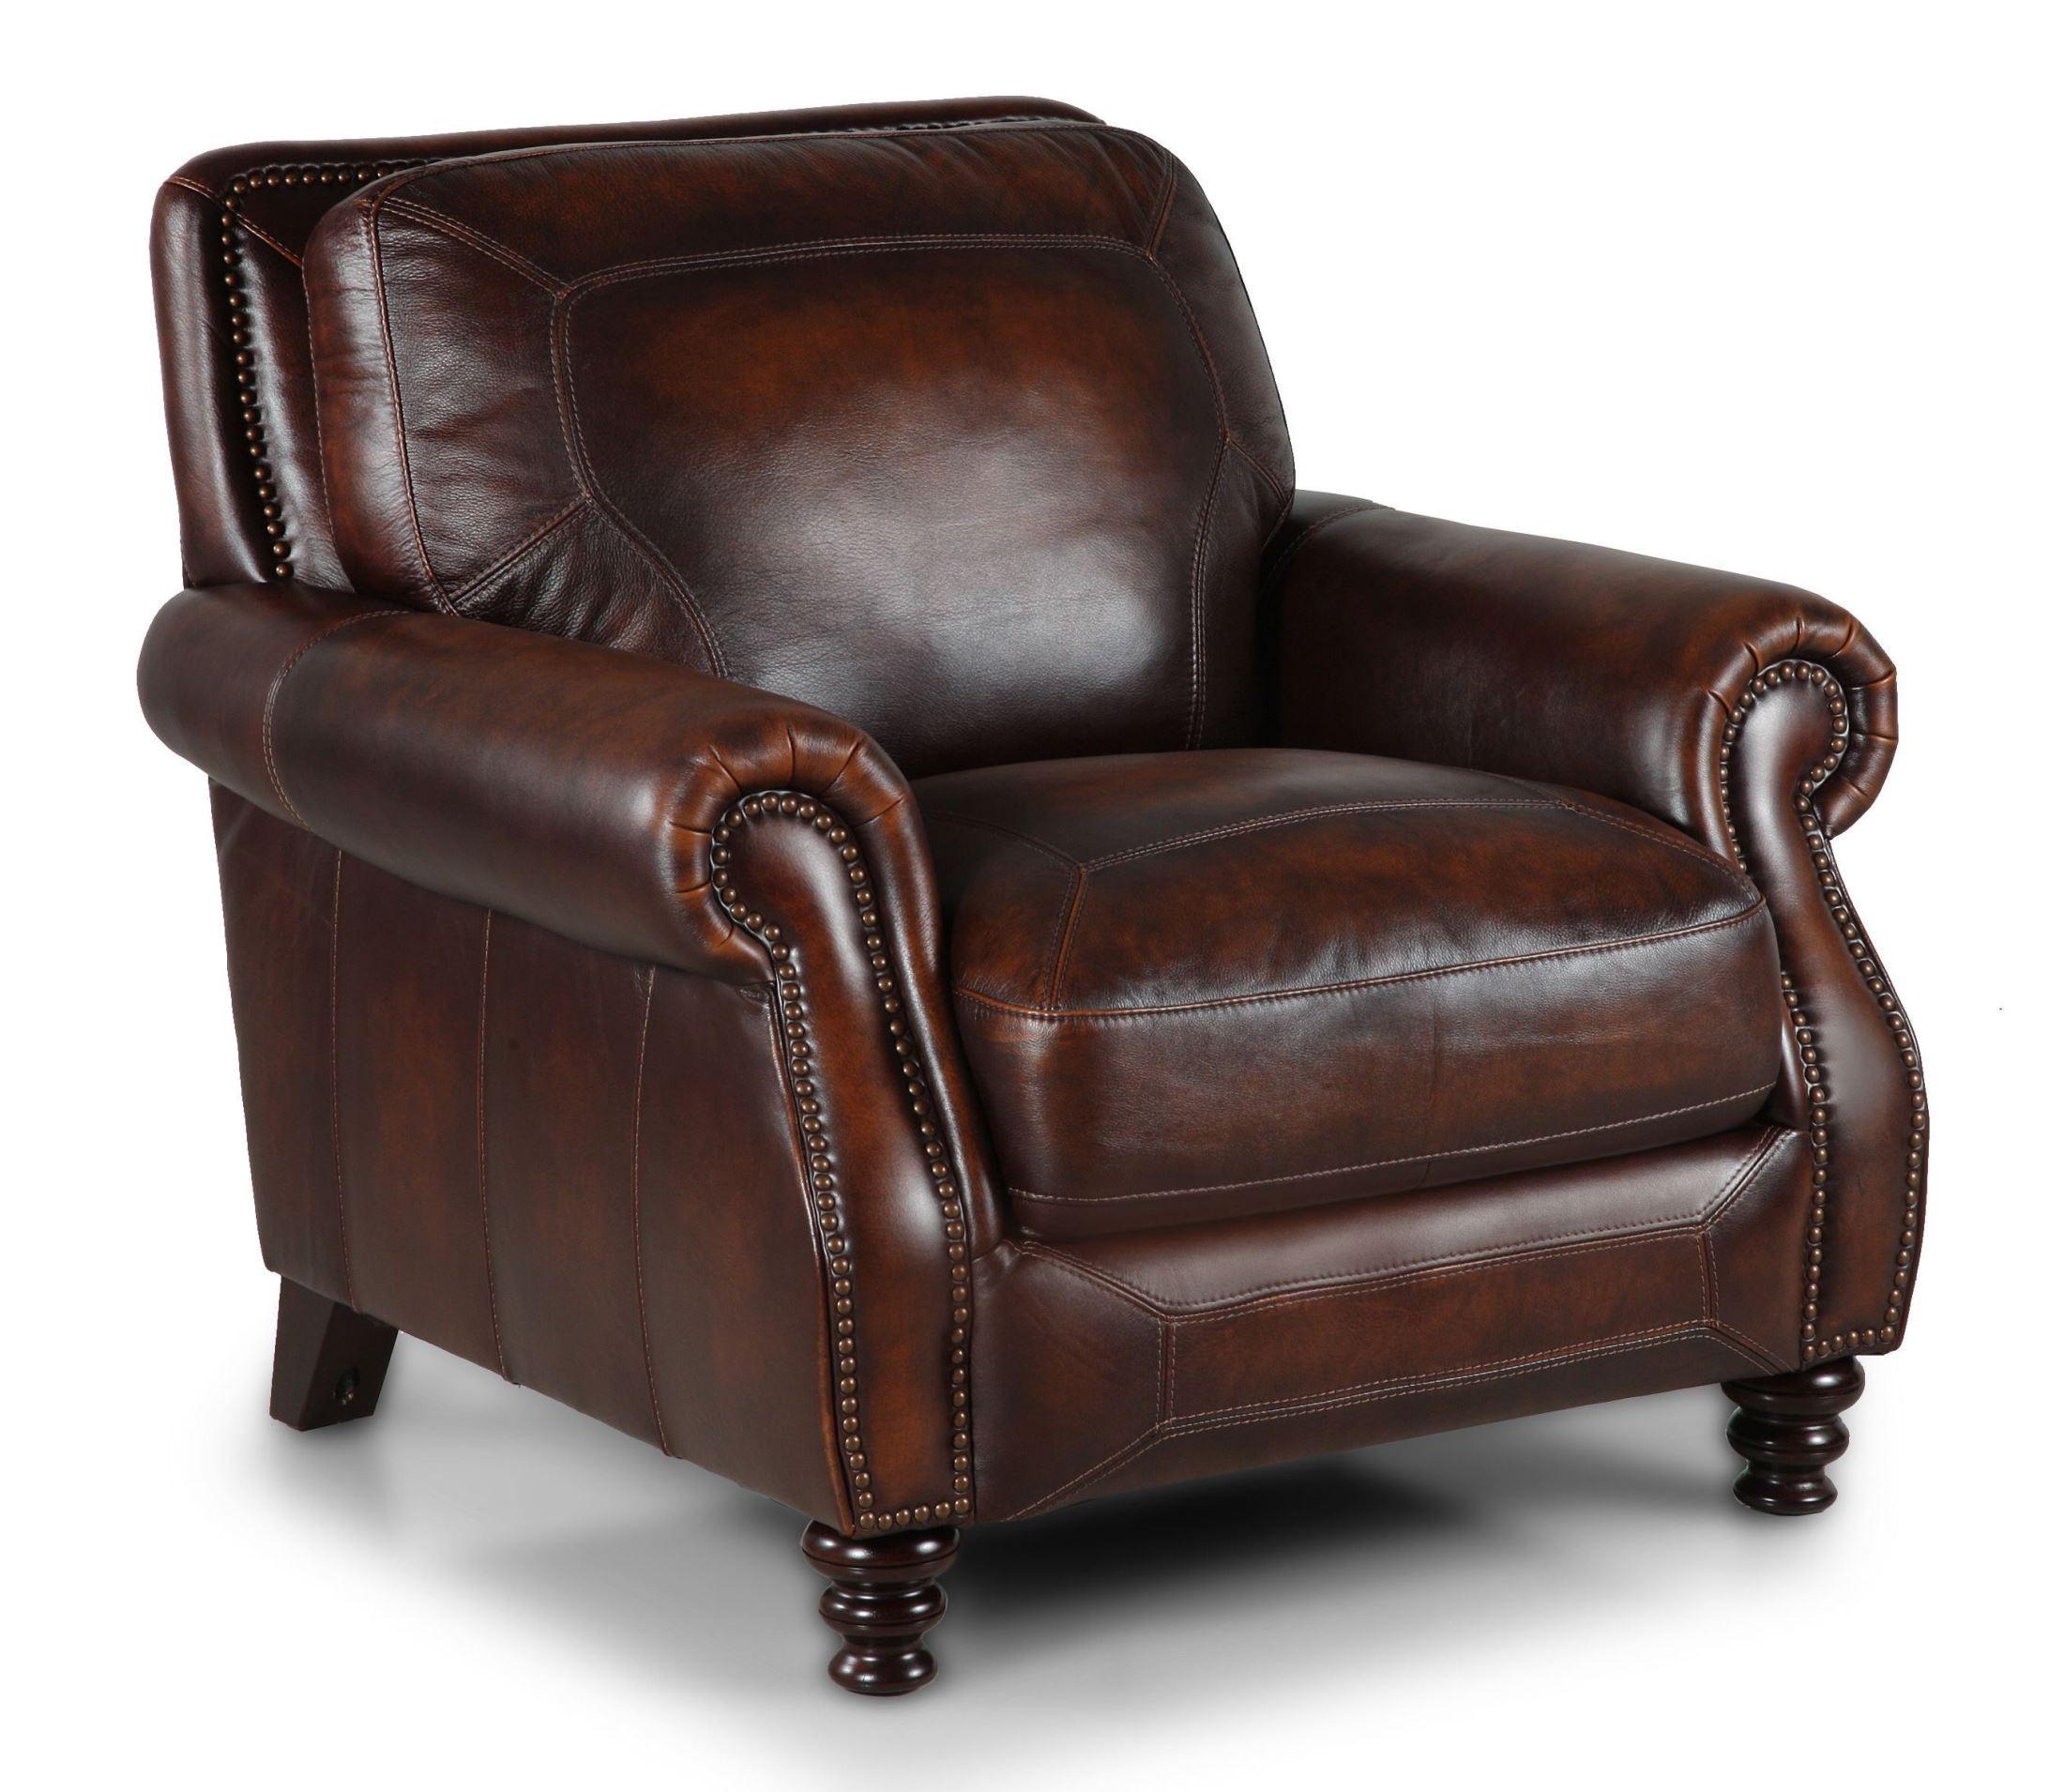 ashland espresso chair from simon li j018 10 w1 hb0d